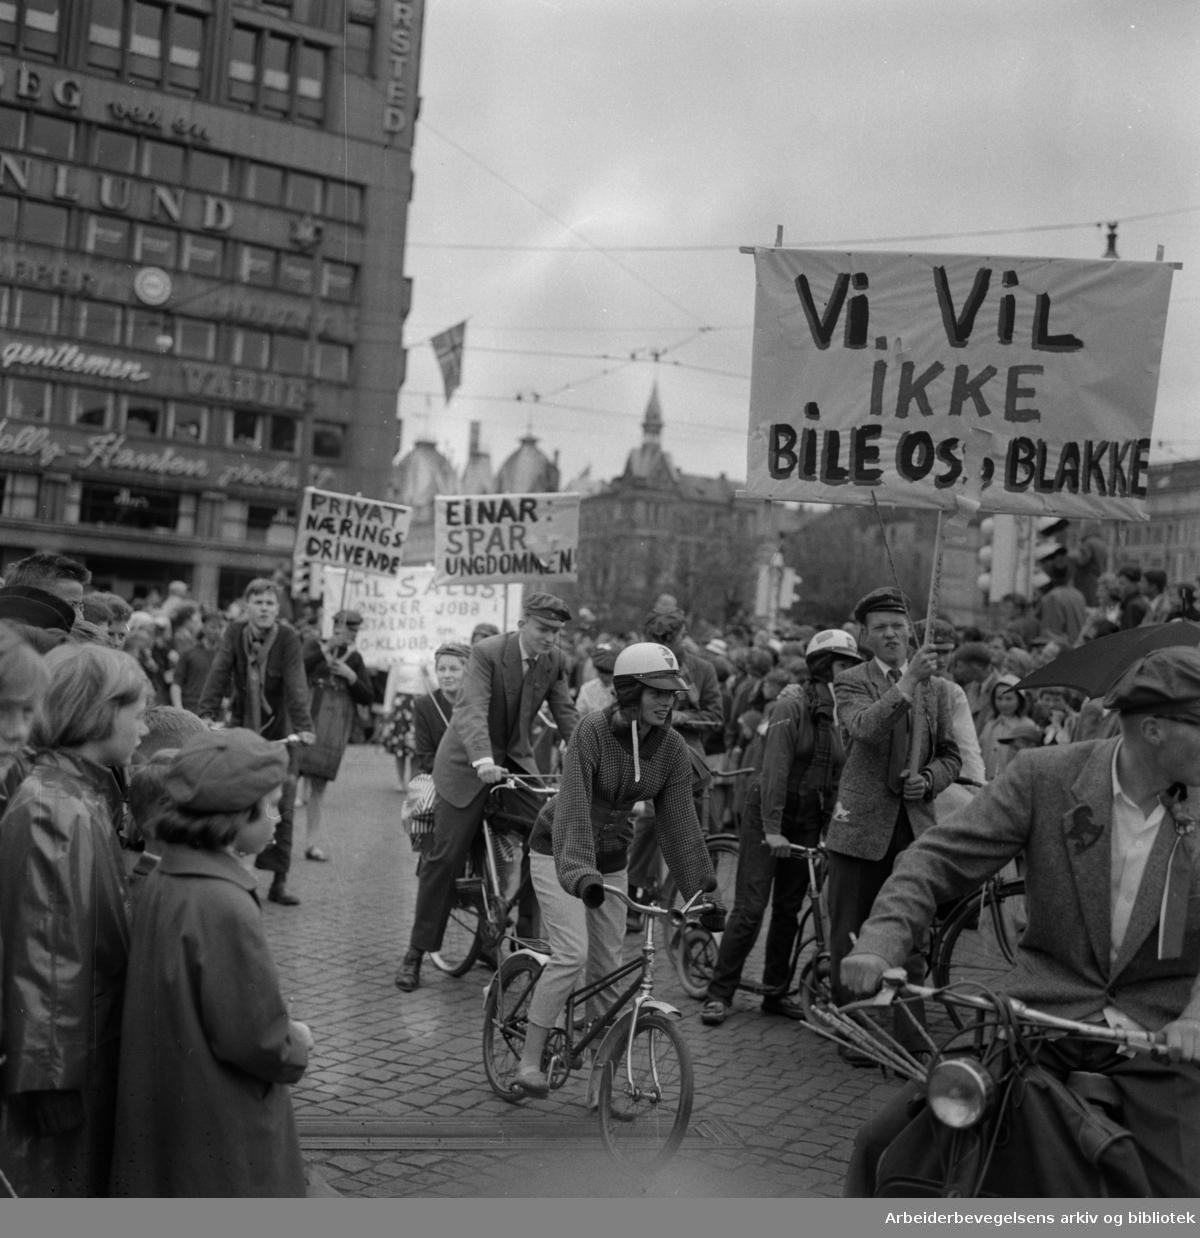 Russetoget. 17. mai 1959. Drammensveien - nå Henrik Ibsens gate. Torstedgården og Victoria terrasse i bakgrunnen.